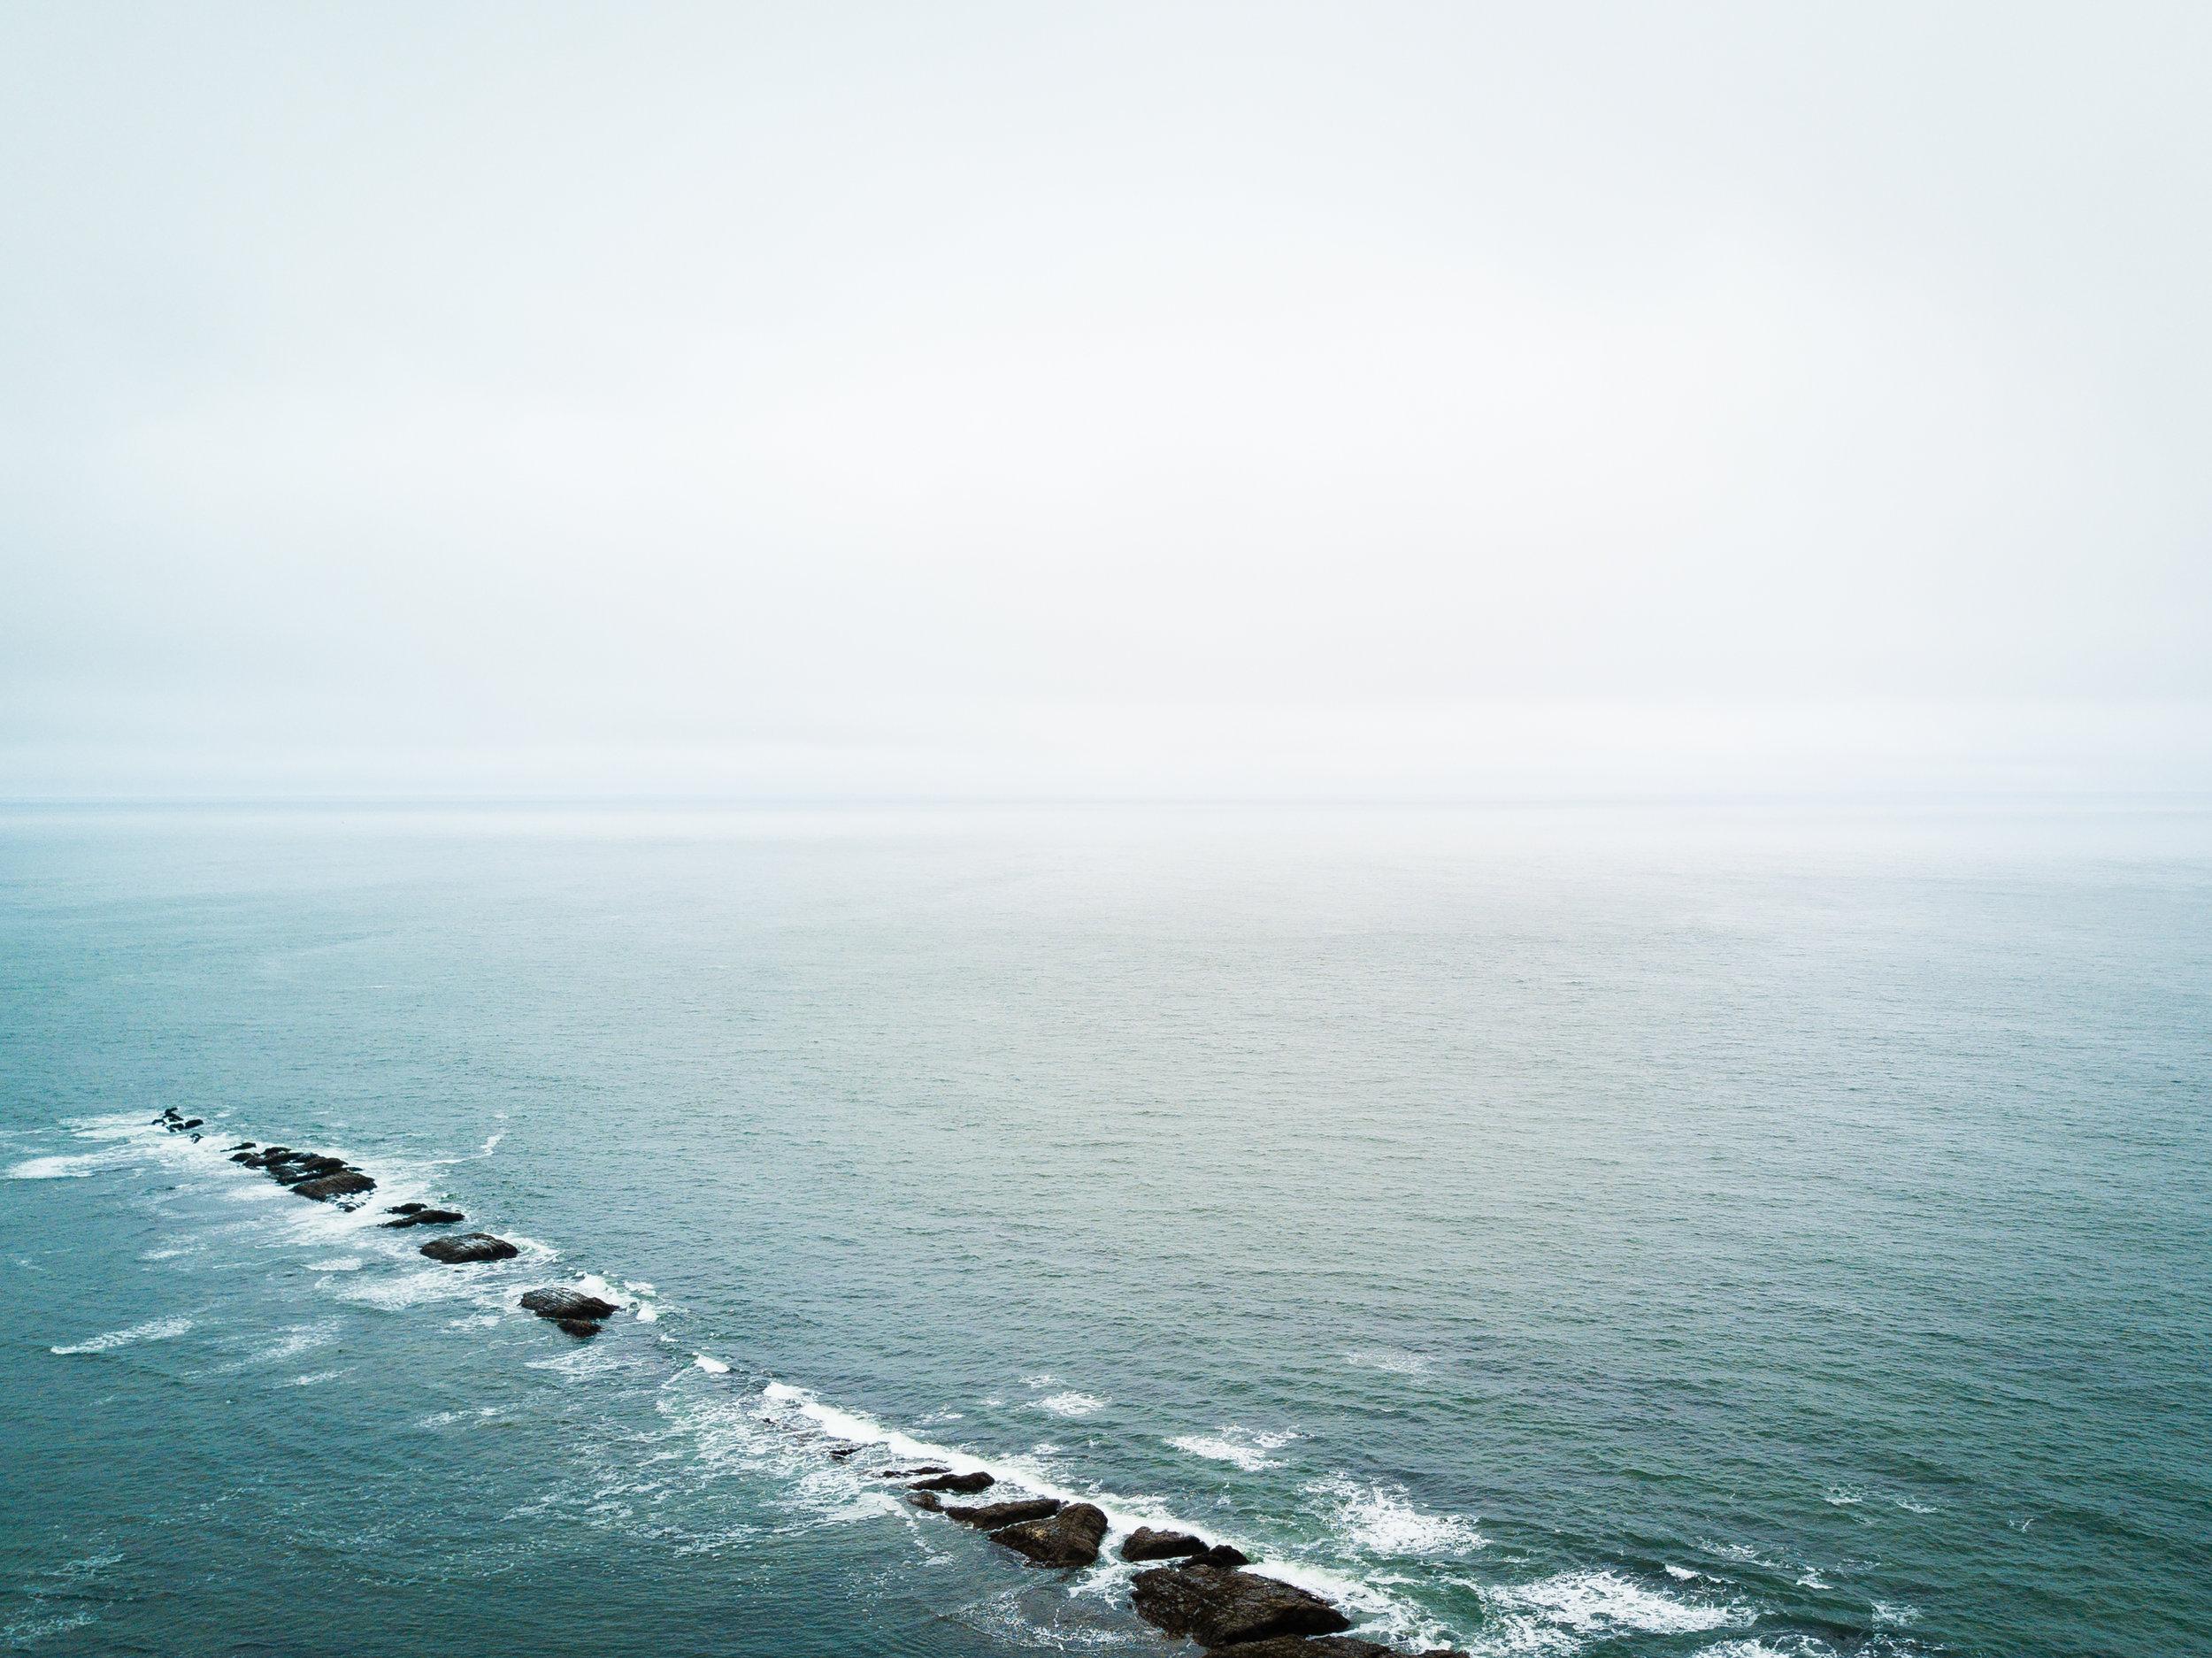 Pacific Ocean, Bolinas, California